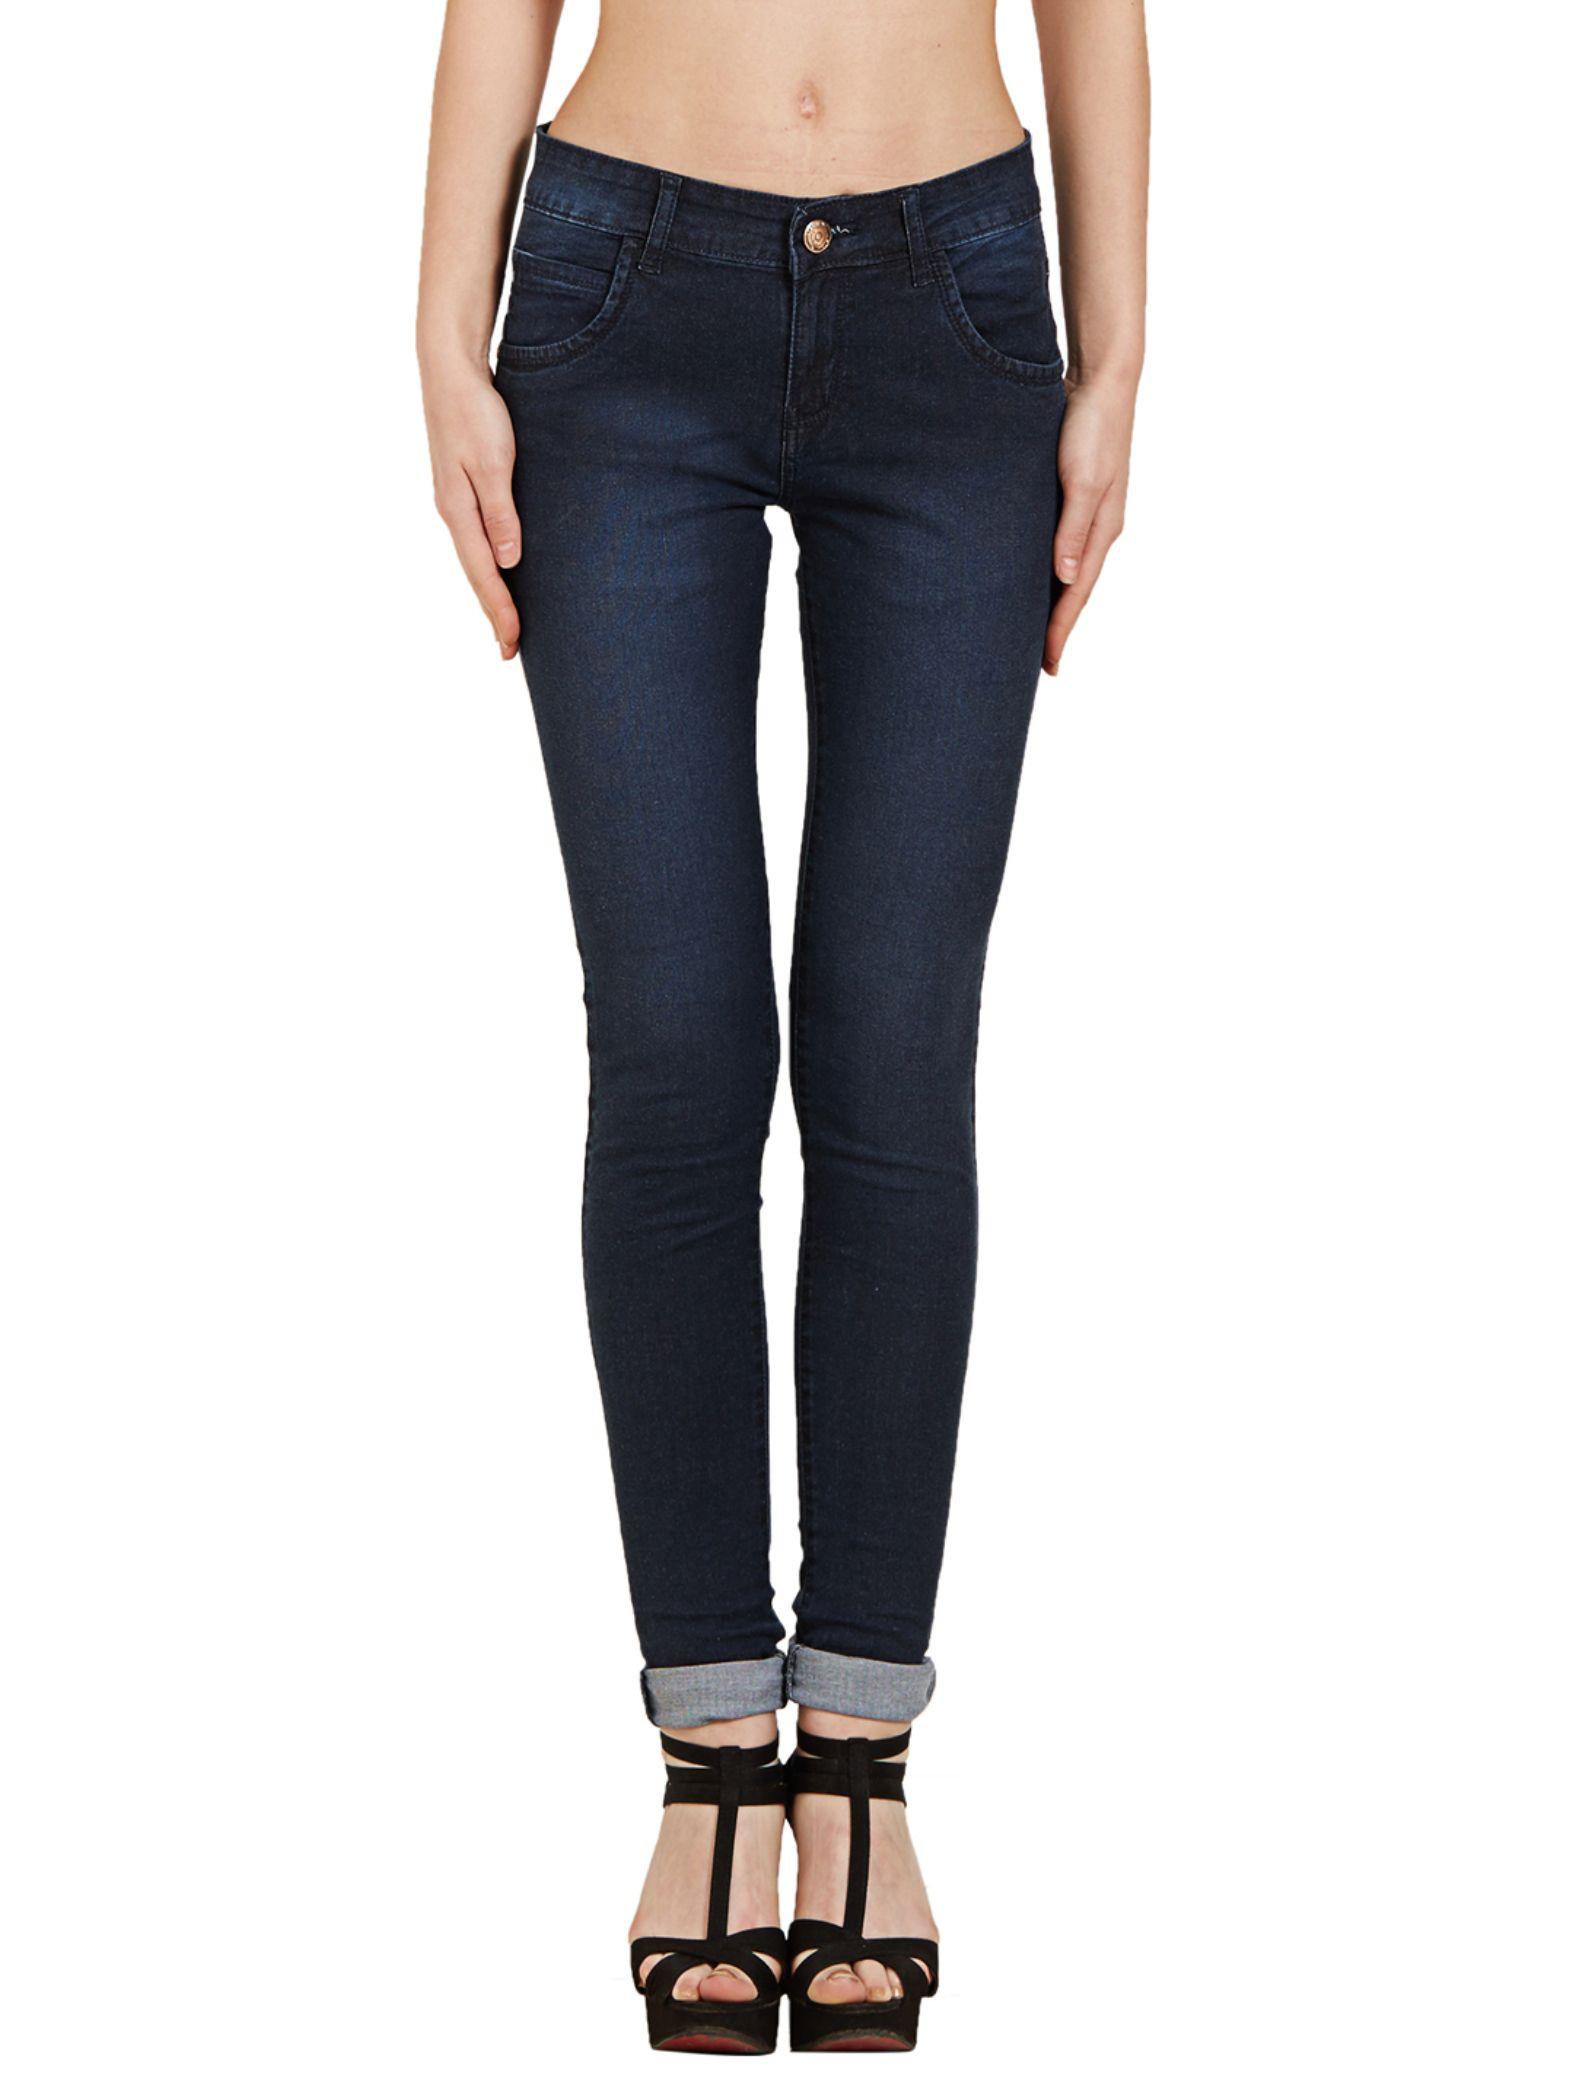 Blancz Denim Jeans - Blue